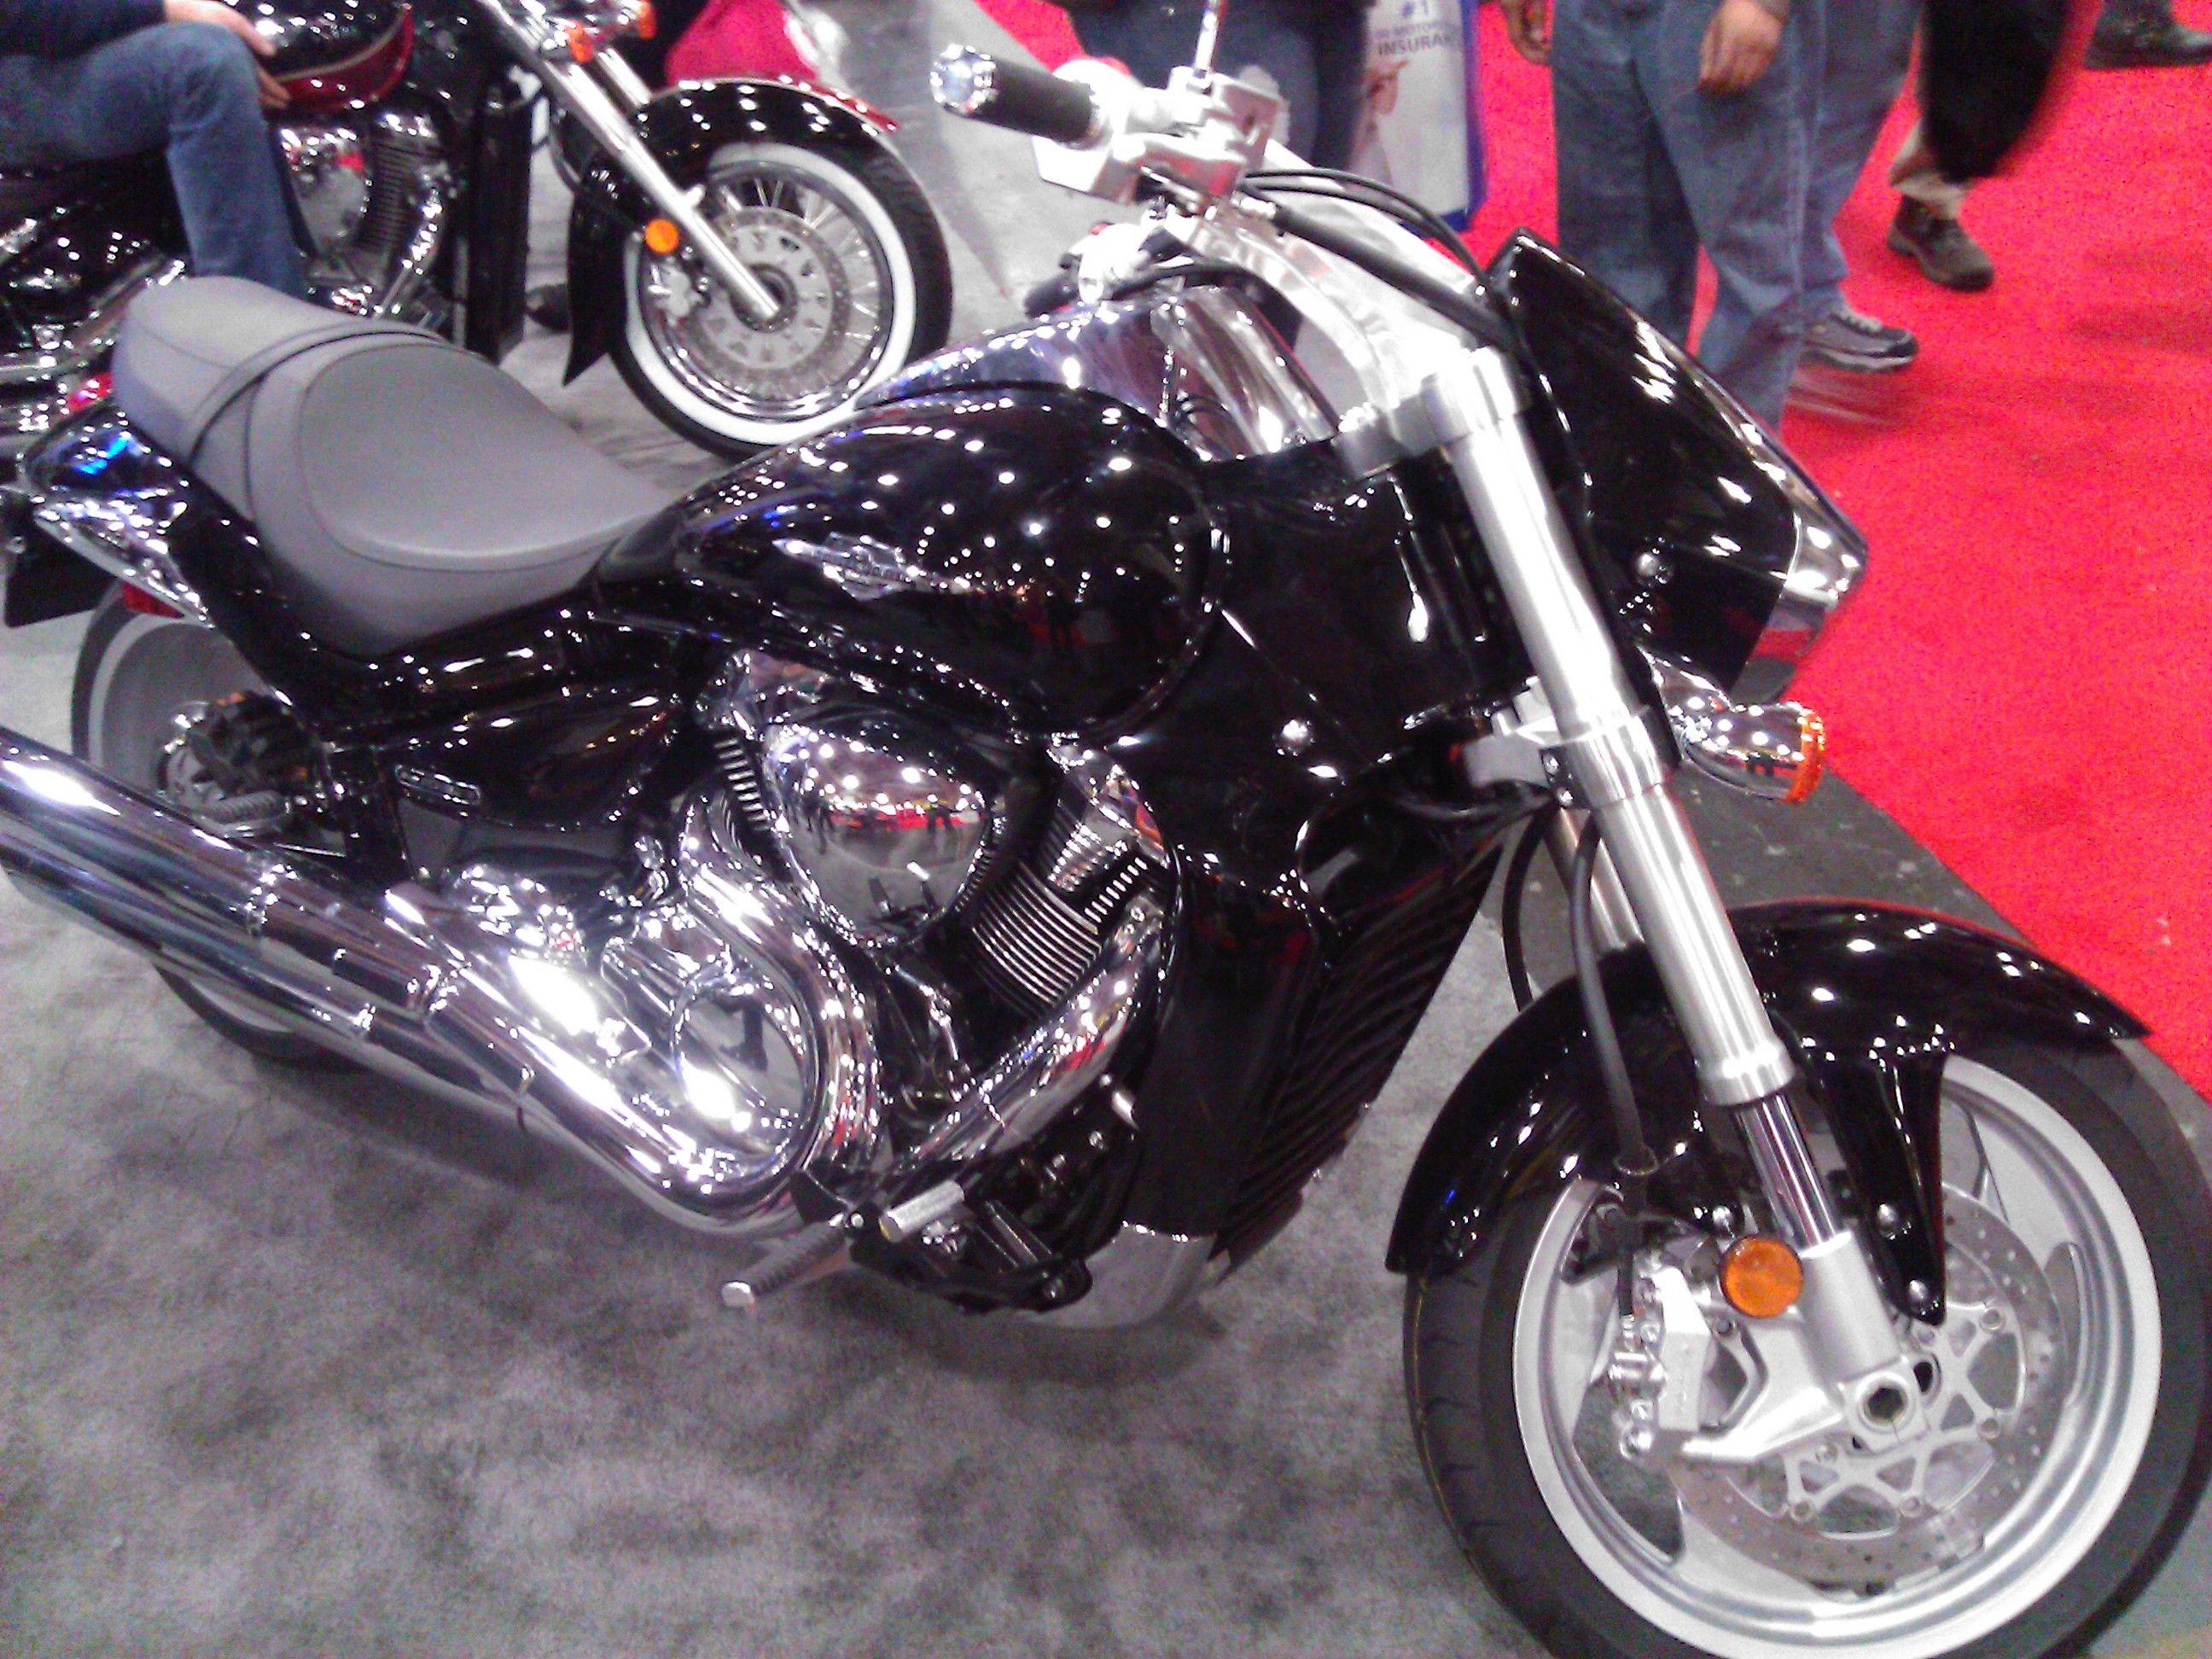 Suzuki boulevard m109r motorcycle cruiser 2013 international motorcycle show in nyc